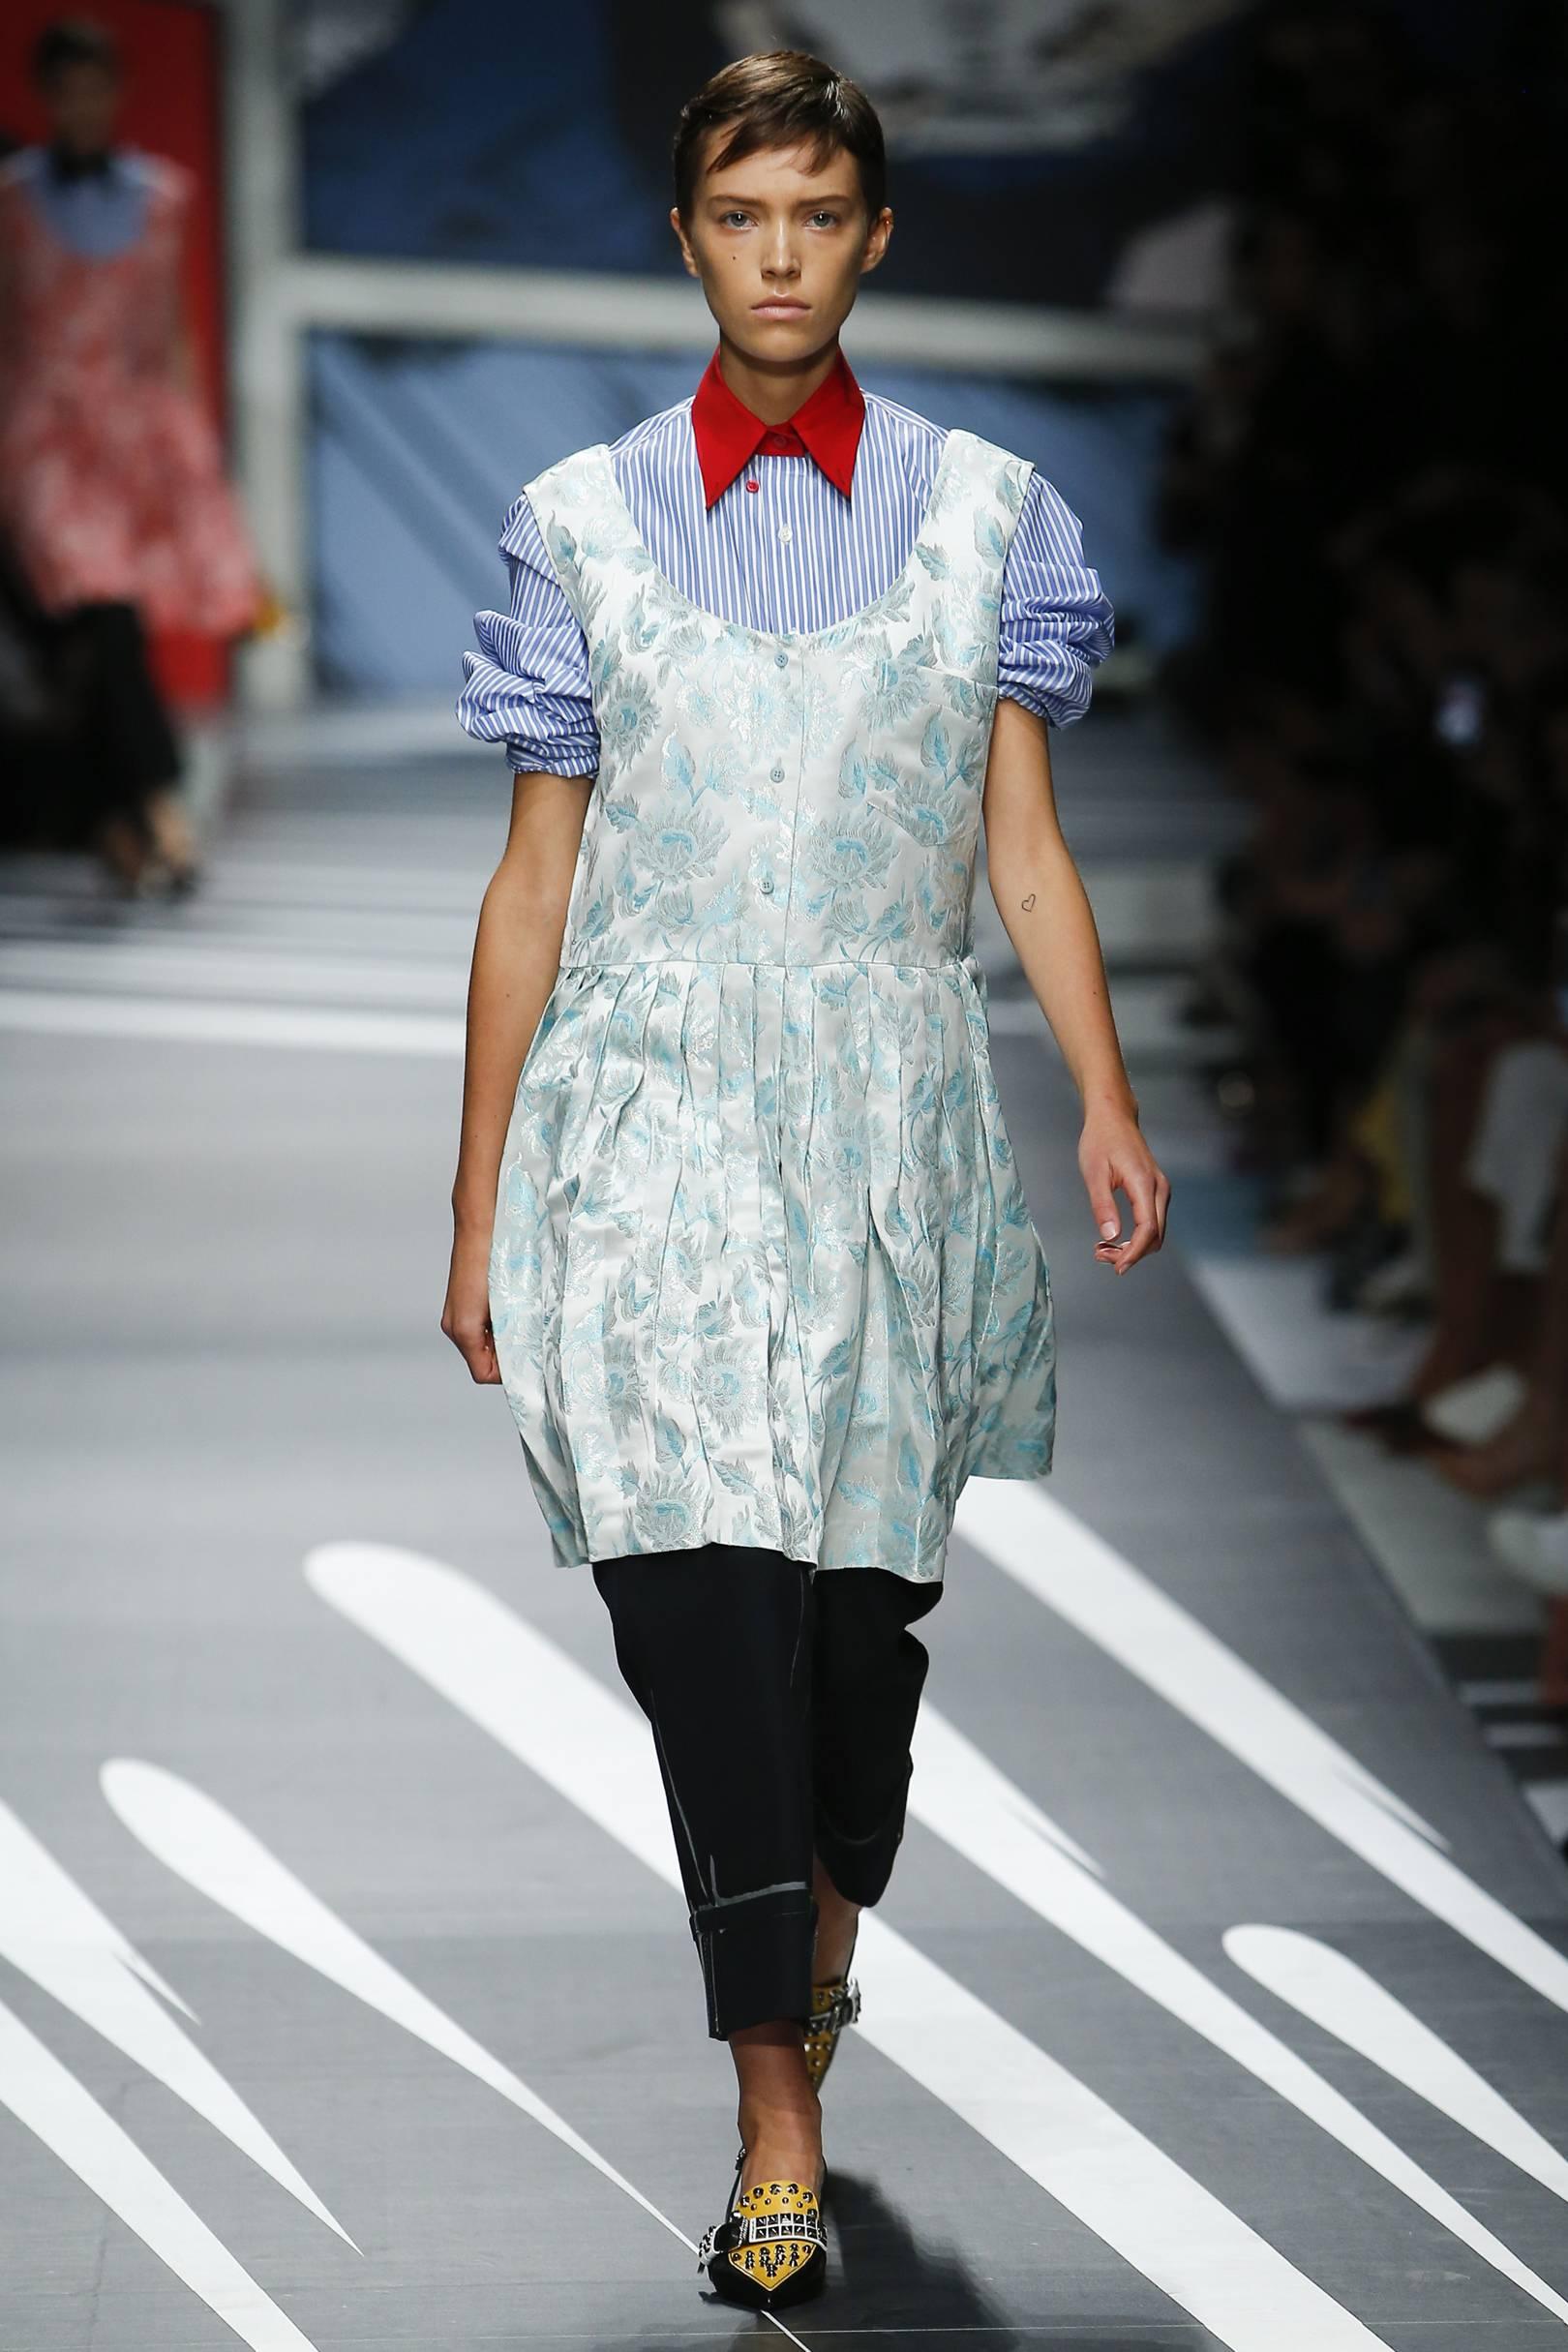 The best layered styling tricks from Milan Fashion Week | British Vogue